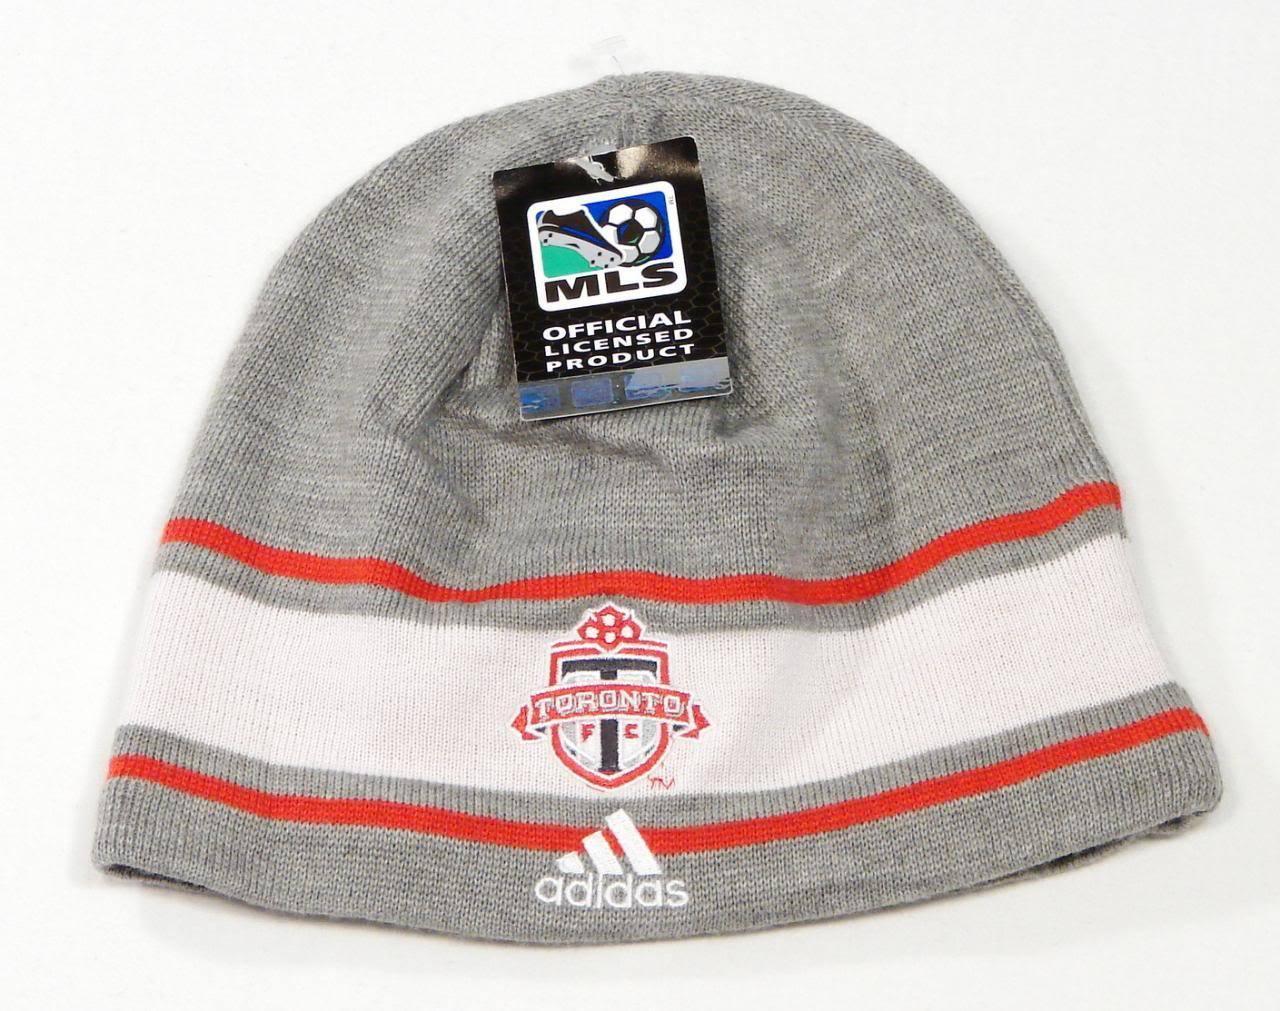 Adidas MLS Toronto FC Football Club Beanie Knit Beanie Club Skull Cap Adult One Size NWT 18867b